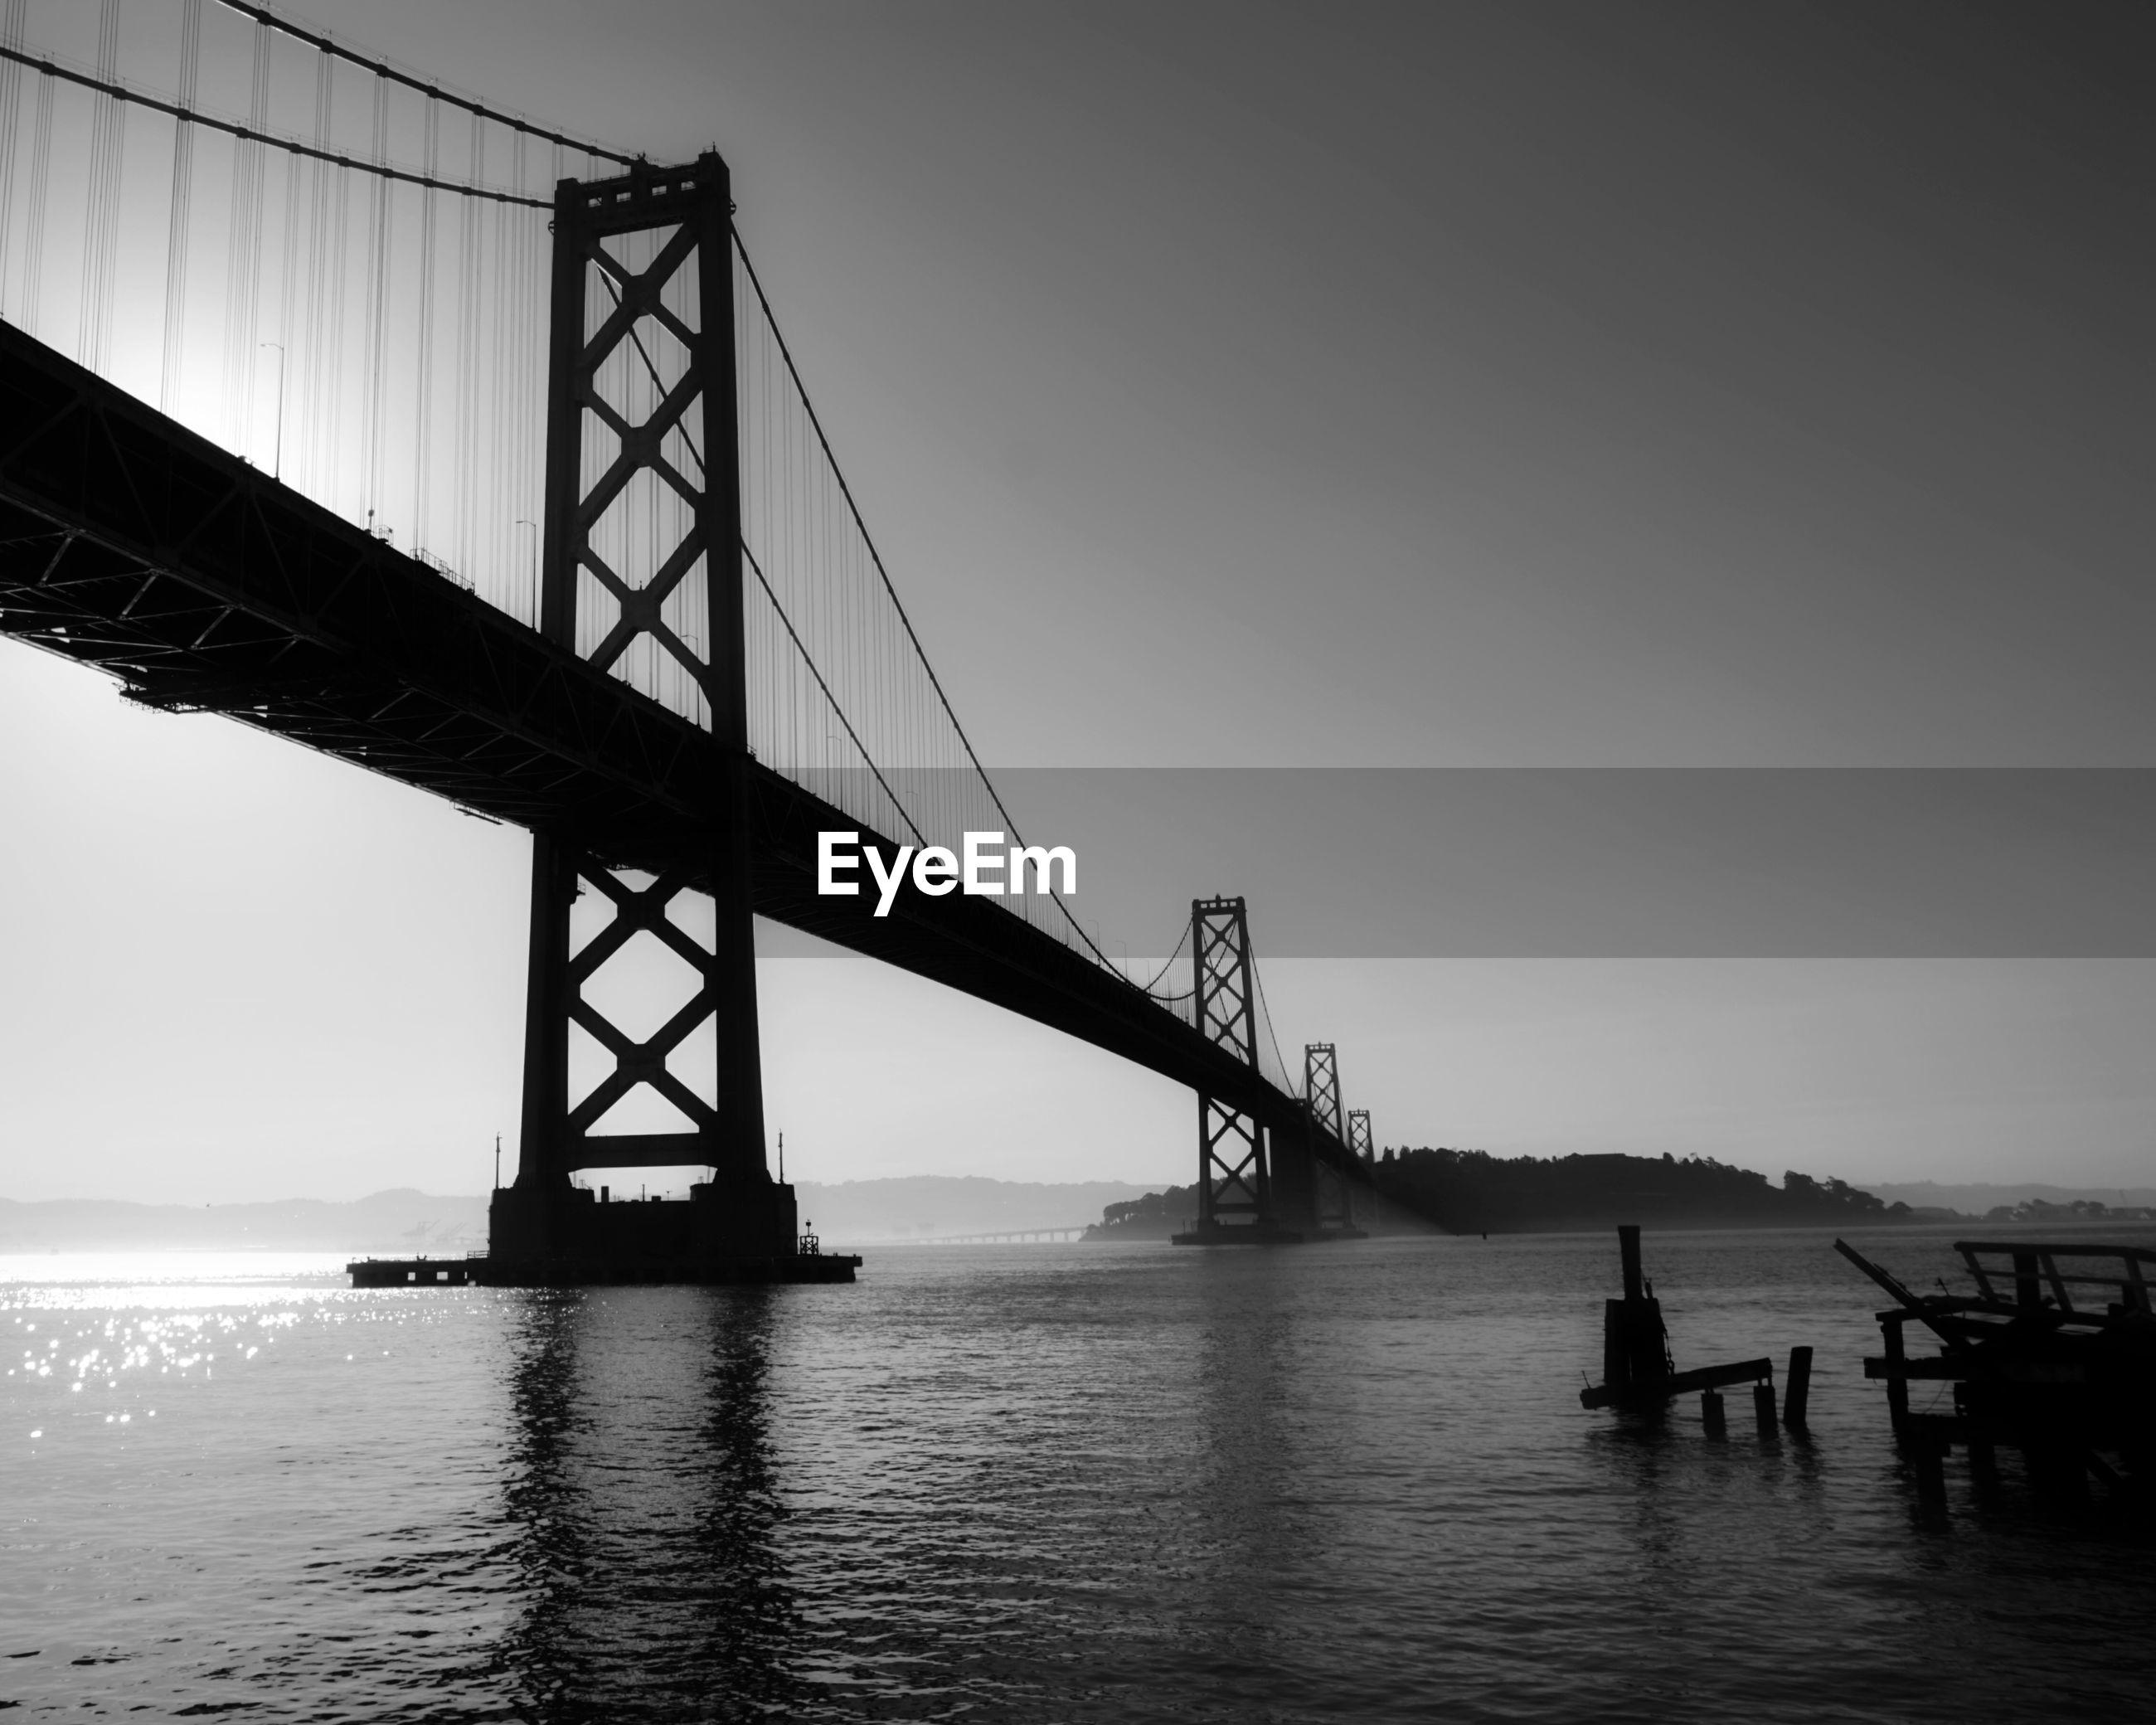 SILHOUETTE OF SUSPENSION BRIDGE IN WATER